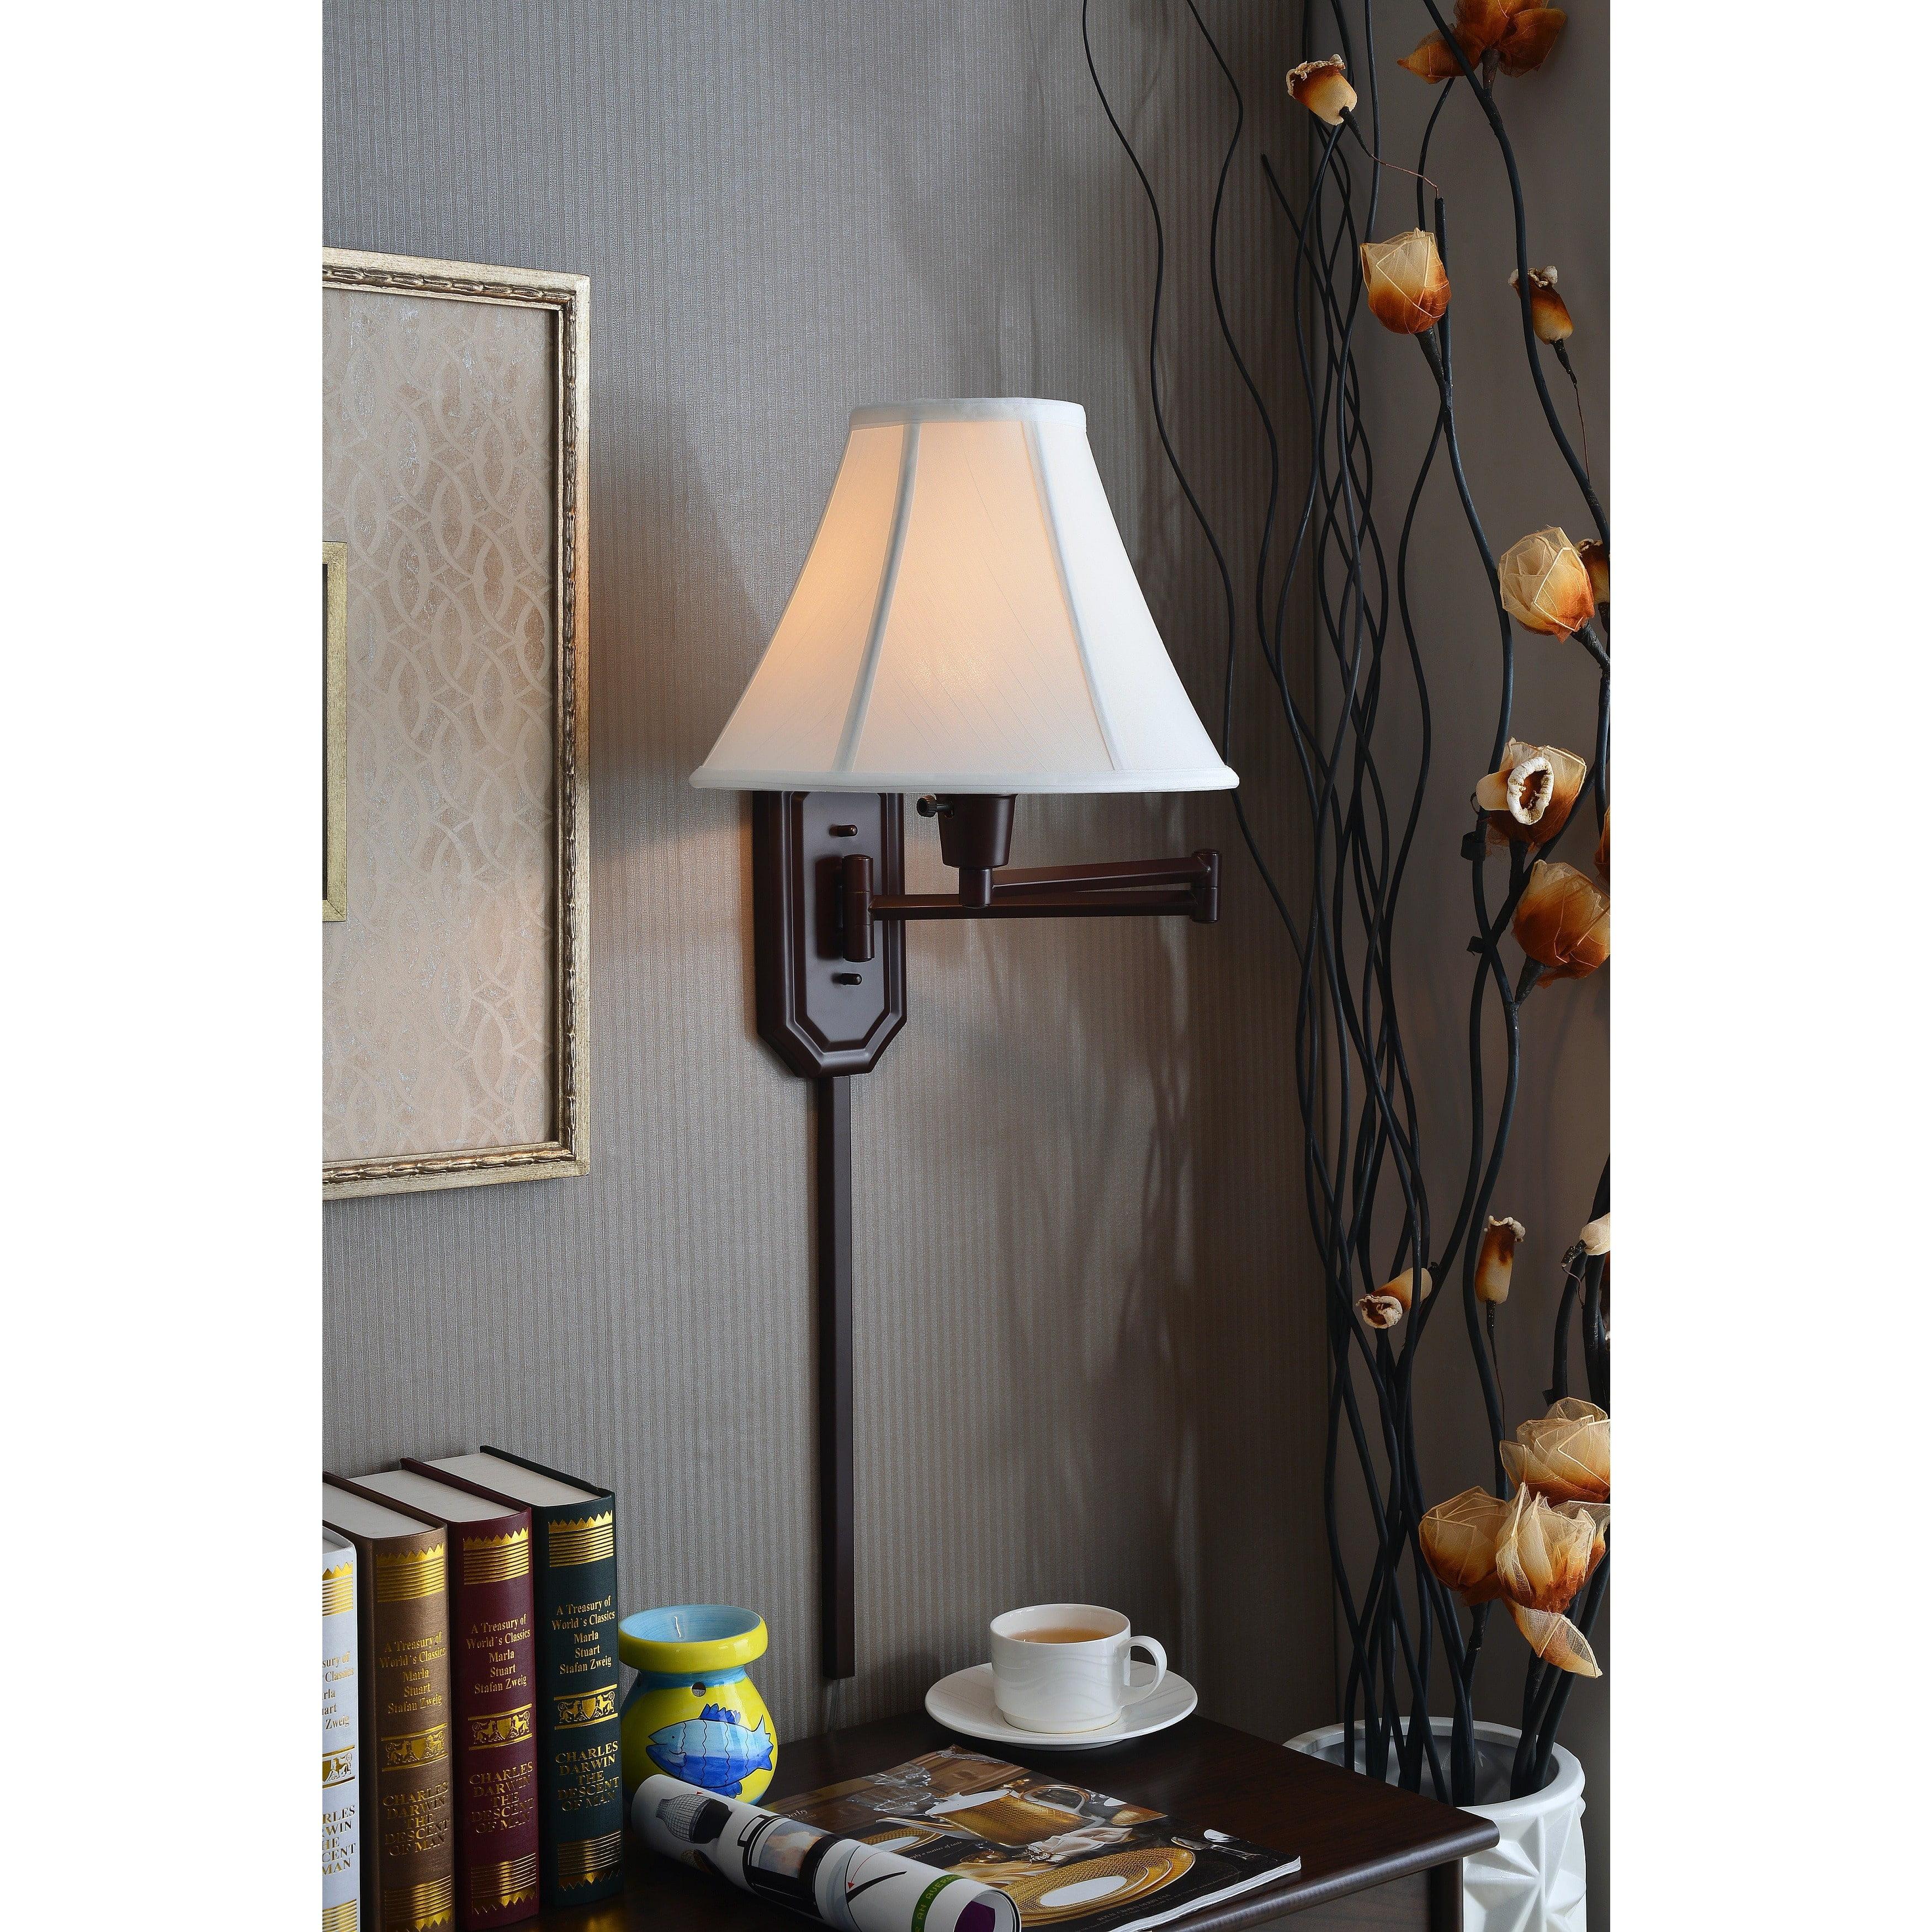 Design Craft Myron Wall Swing Arm Light by Overstock